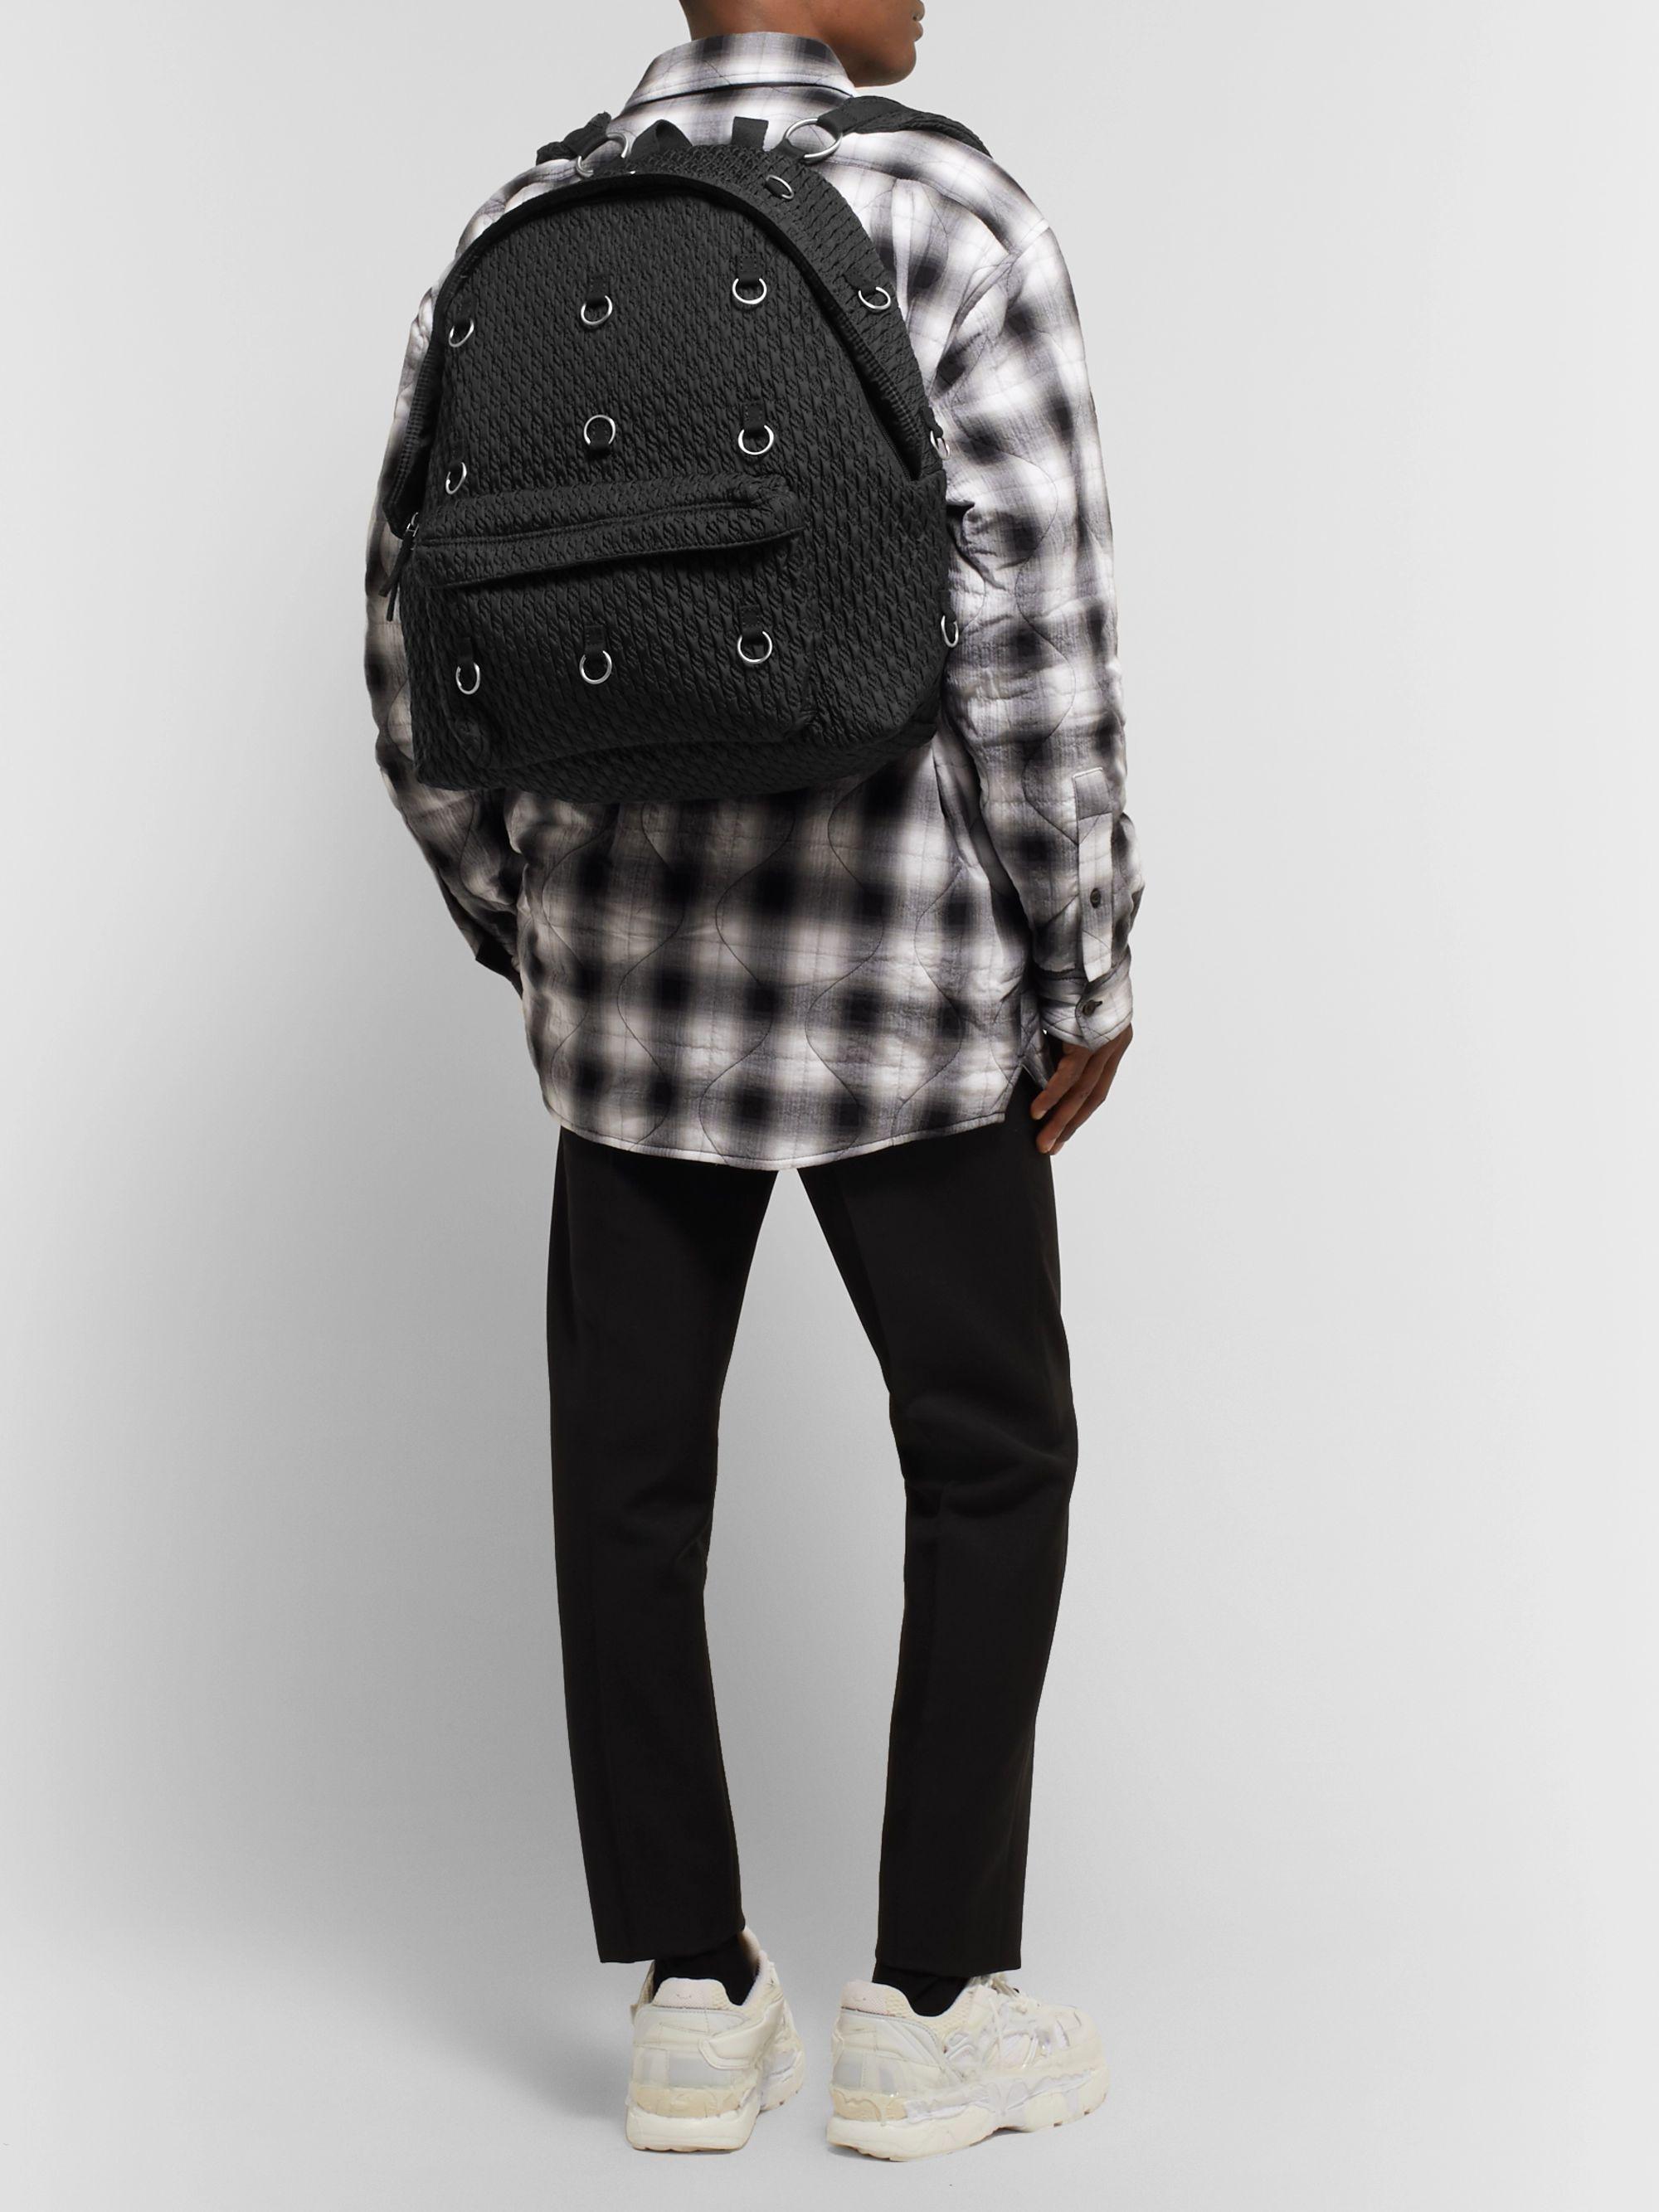 Eastpak Padded Pak'r Bag in Black and Grey Eastpak Padded